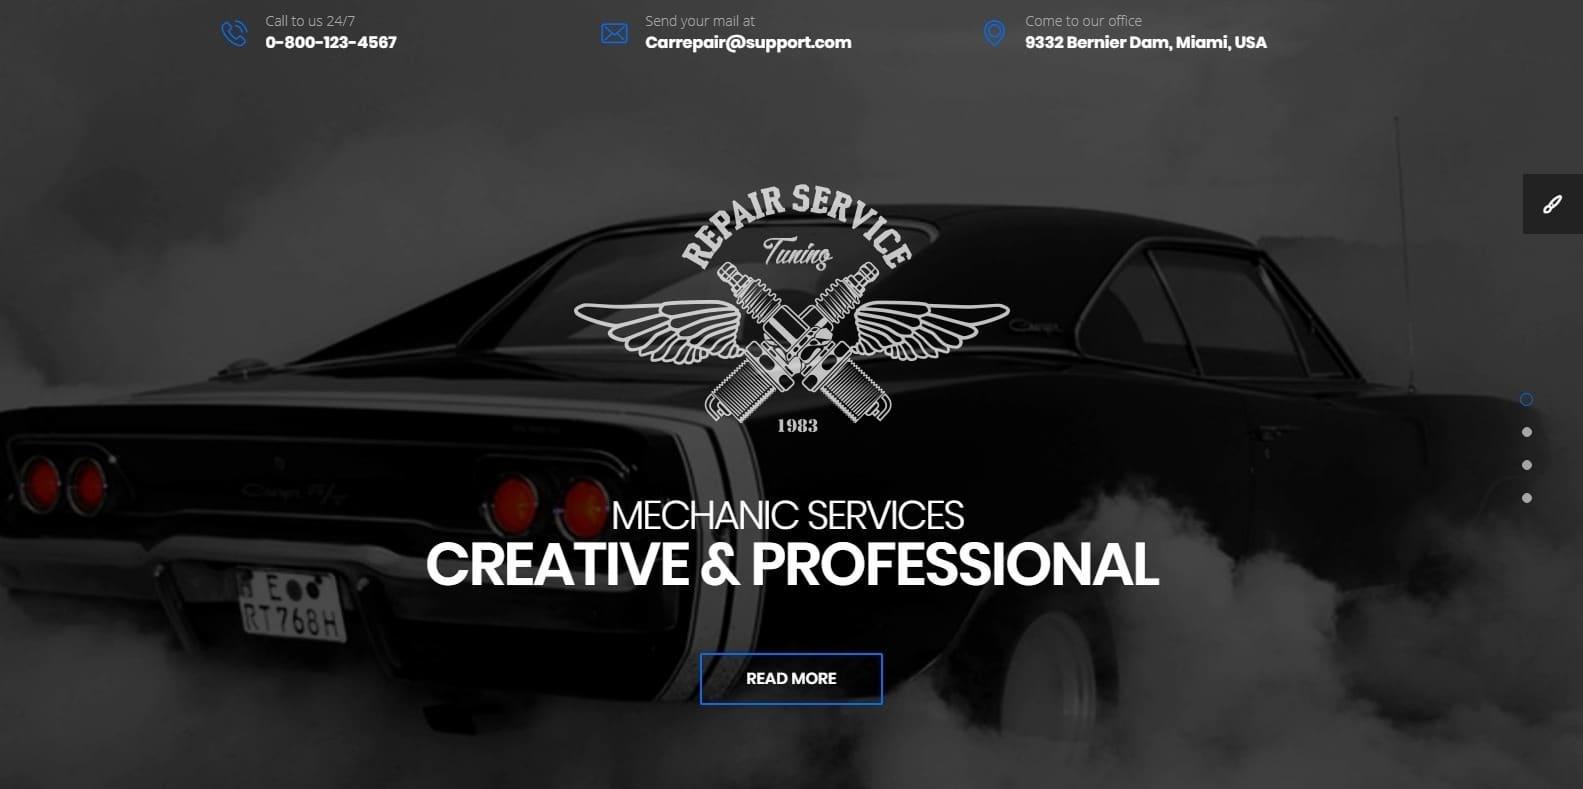 car-repair-automotive-website-template